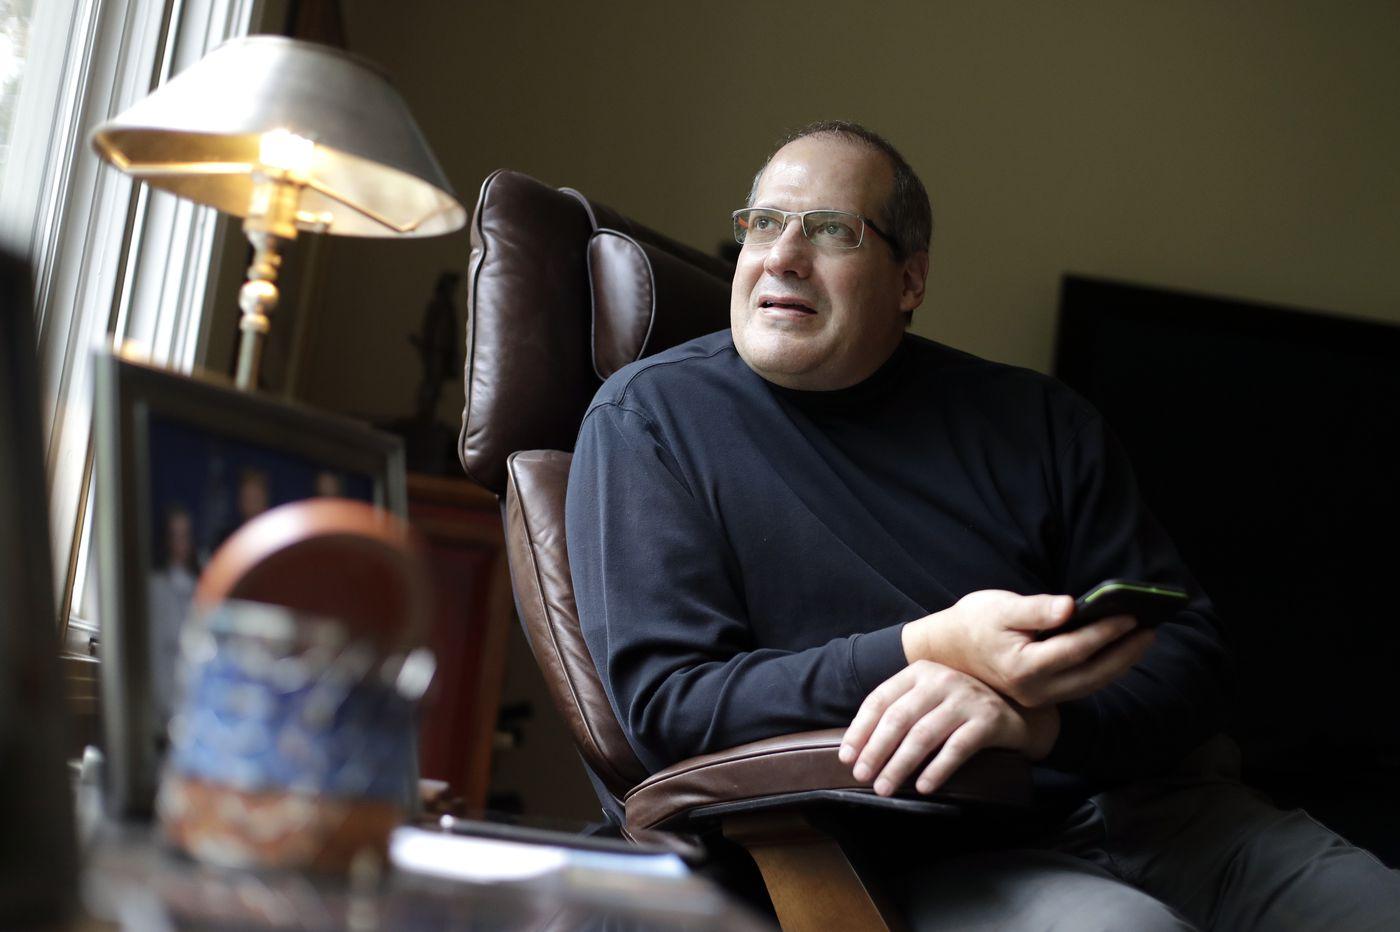 NRA turmoil creates rift among some big donors